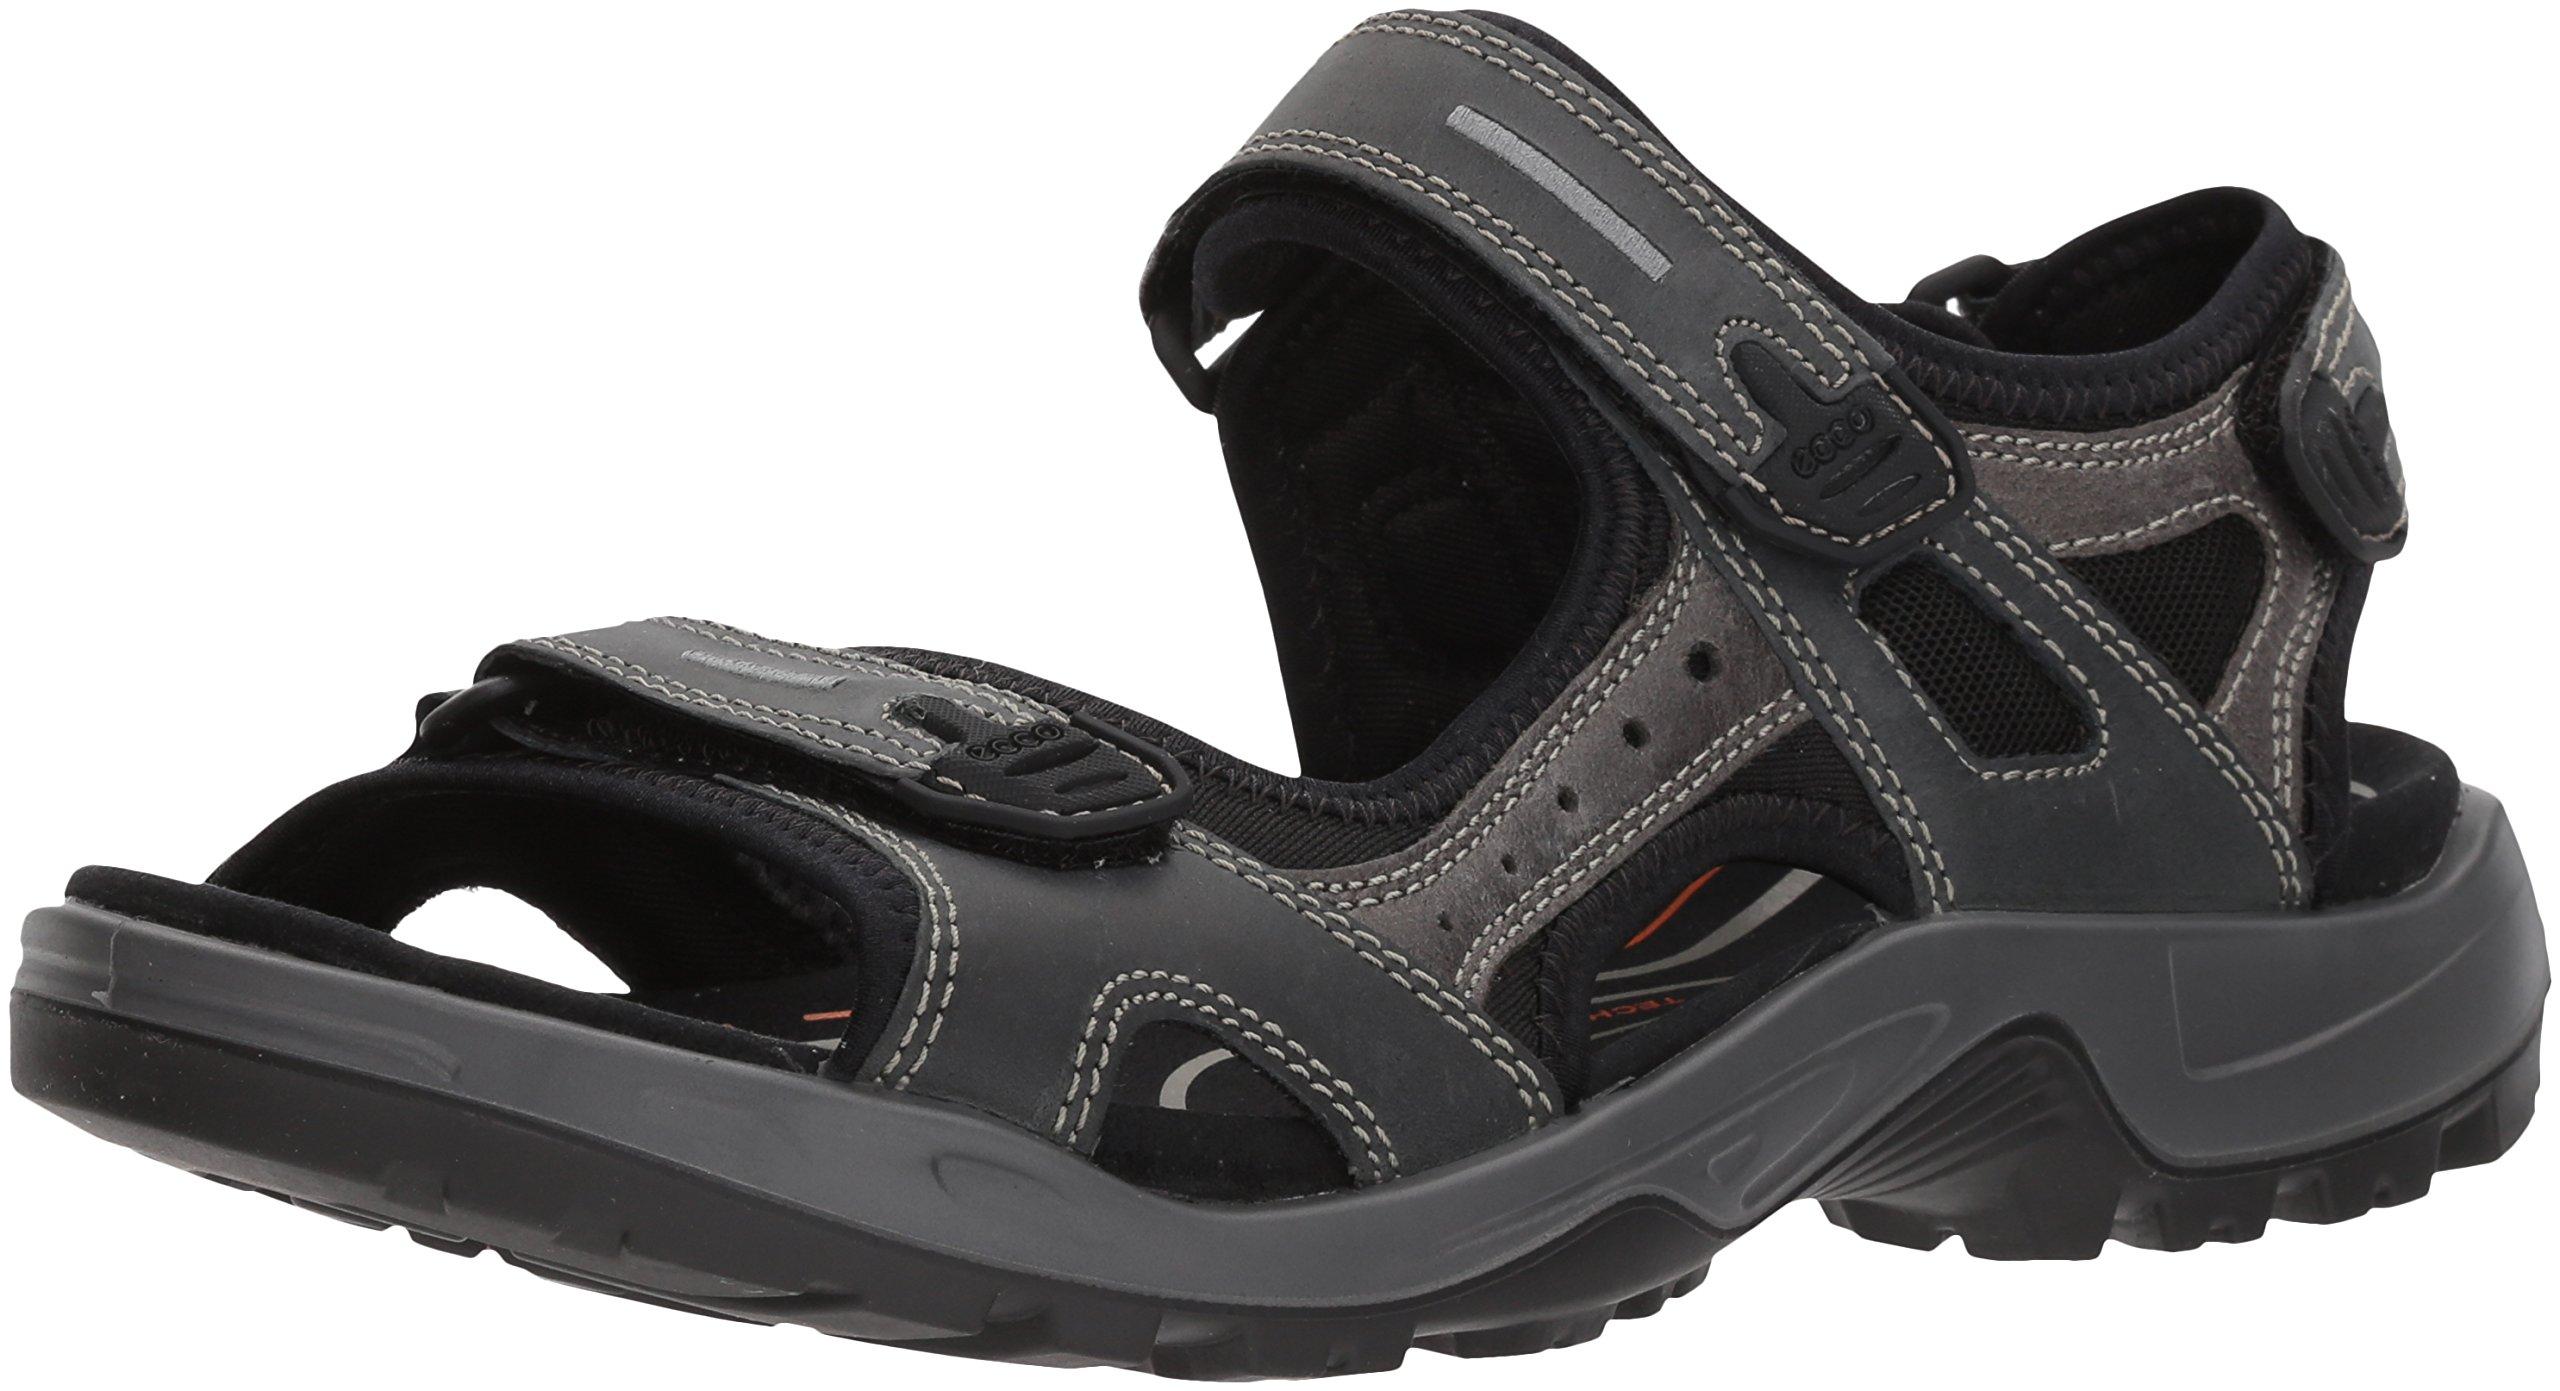 ECCO Men's Yucatan Athletic Sandal, Marine, 45 EU/11-11.5 M US